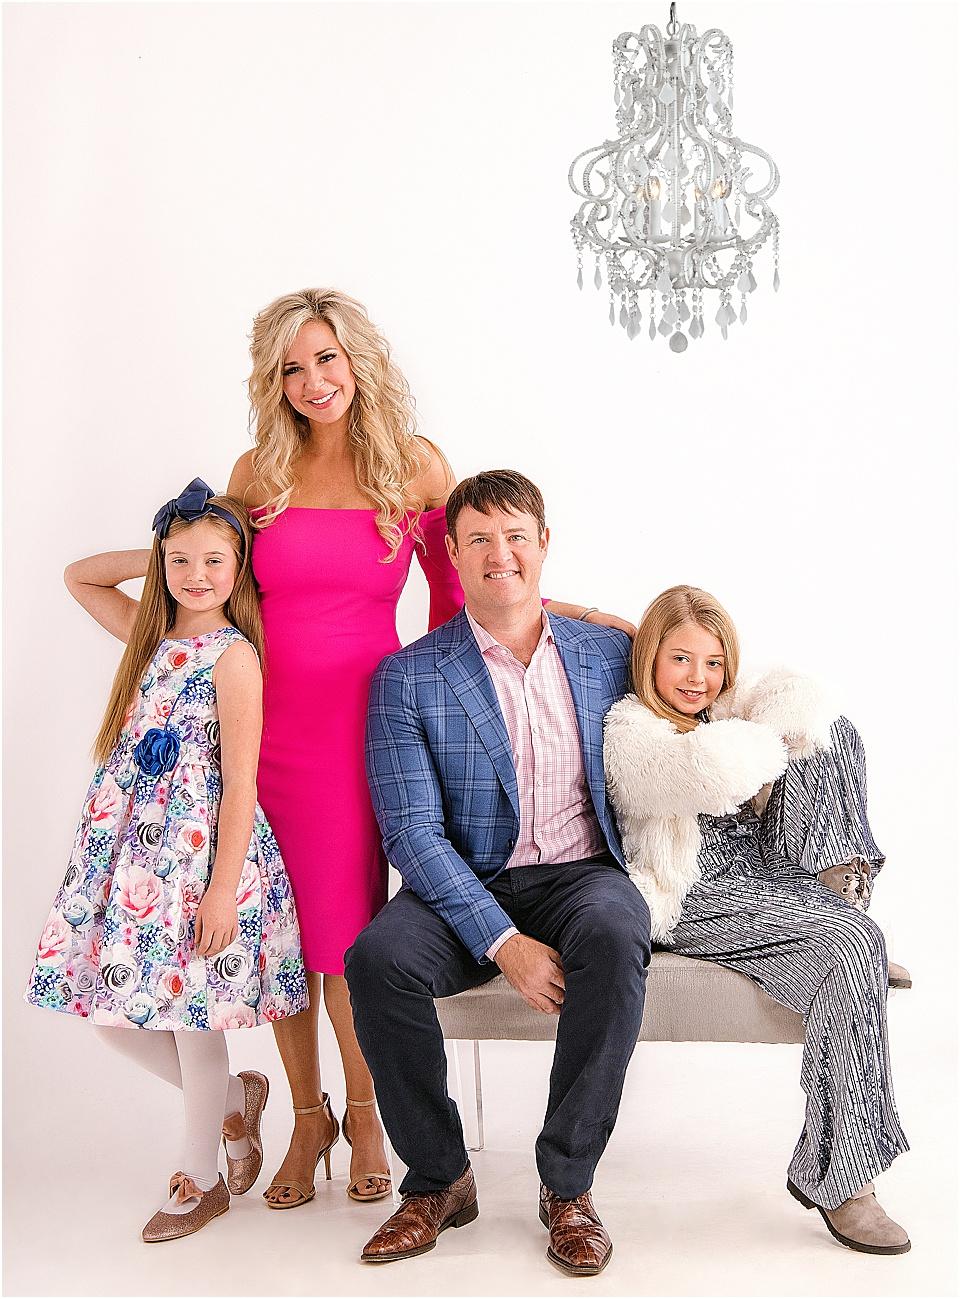 The Wadlow Family   pc:  StudioBPortraits.com    Issaquah WA